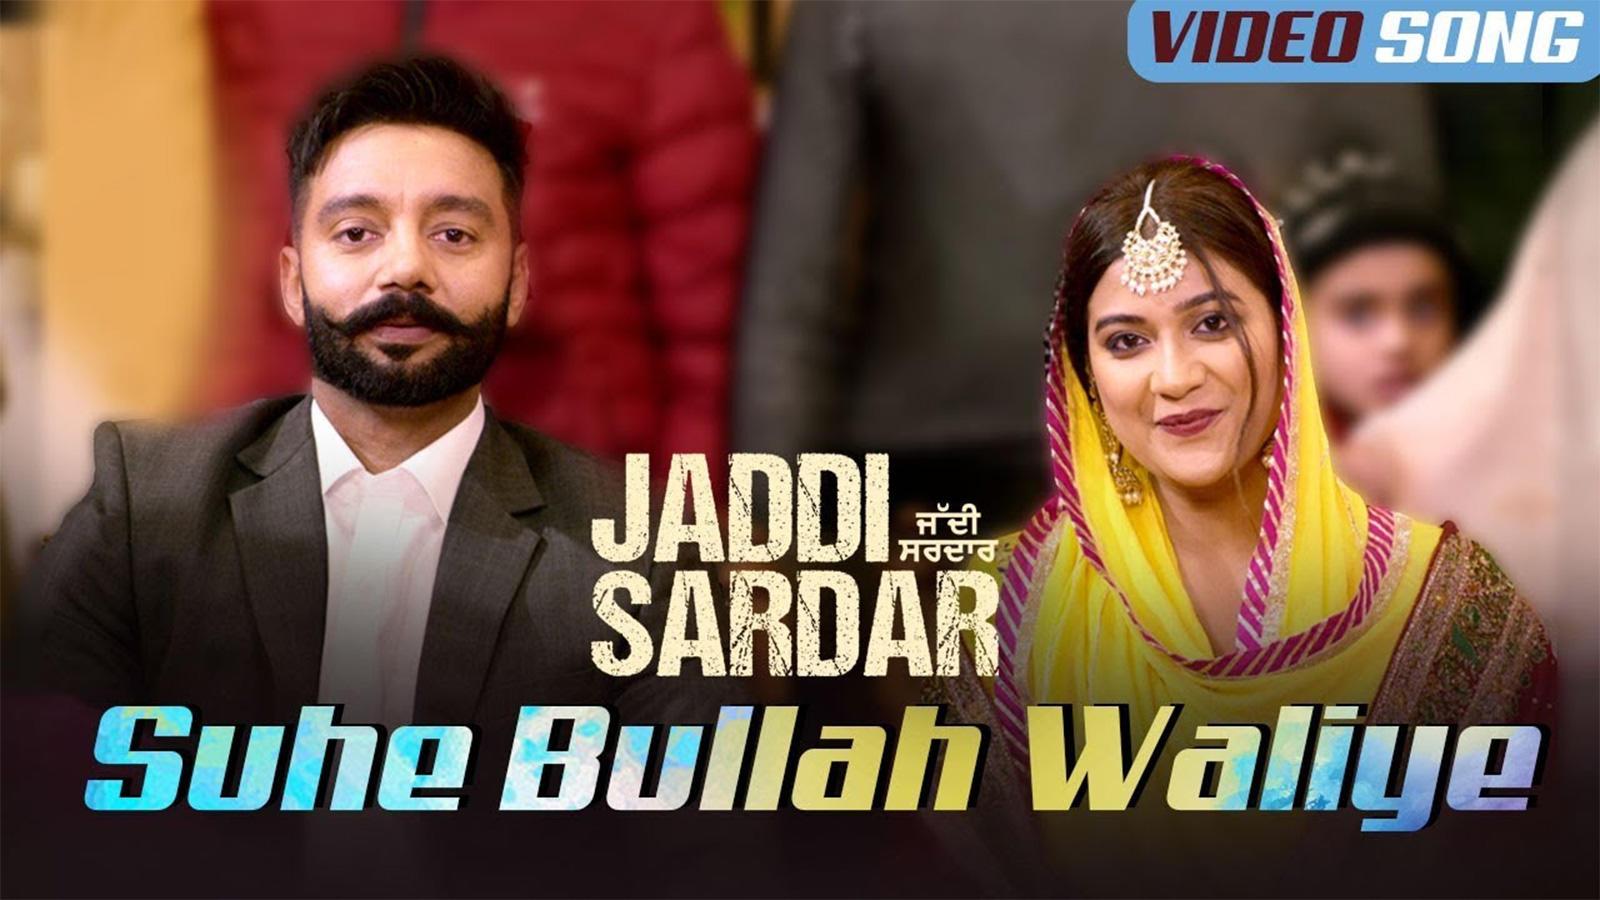 Jaddi Sardar | Song - Suhe Bullan Waliye